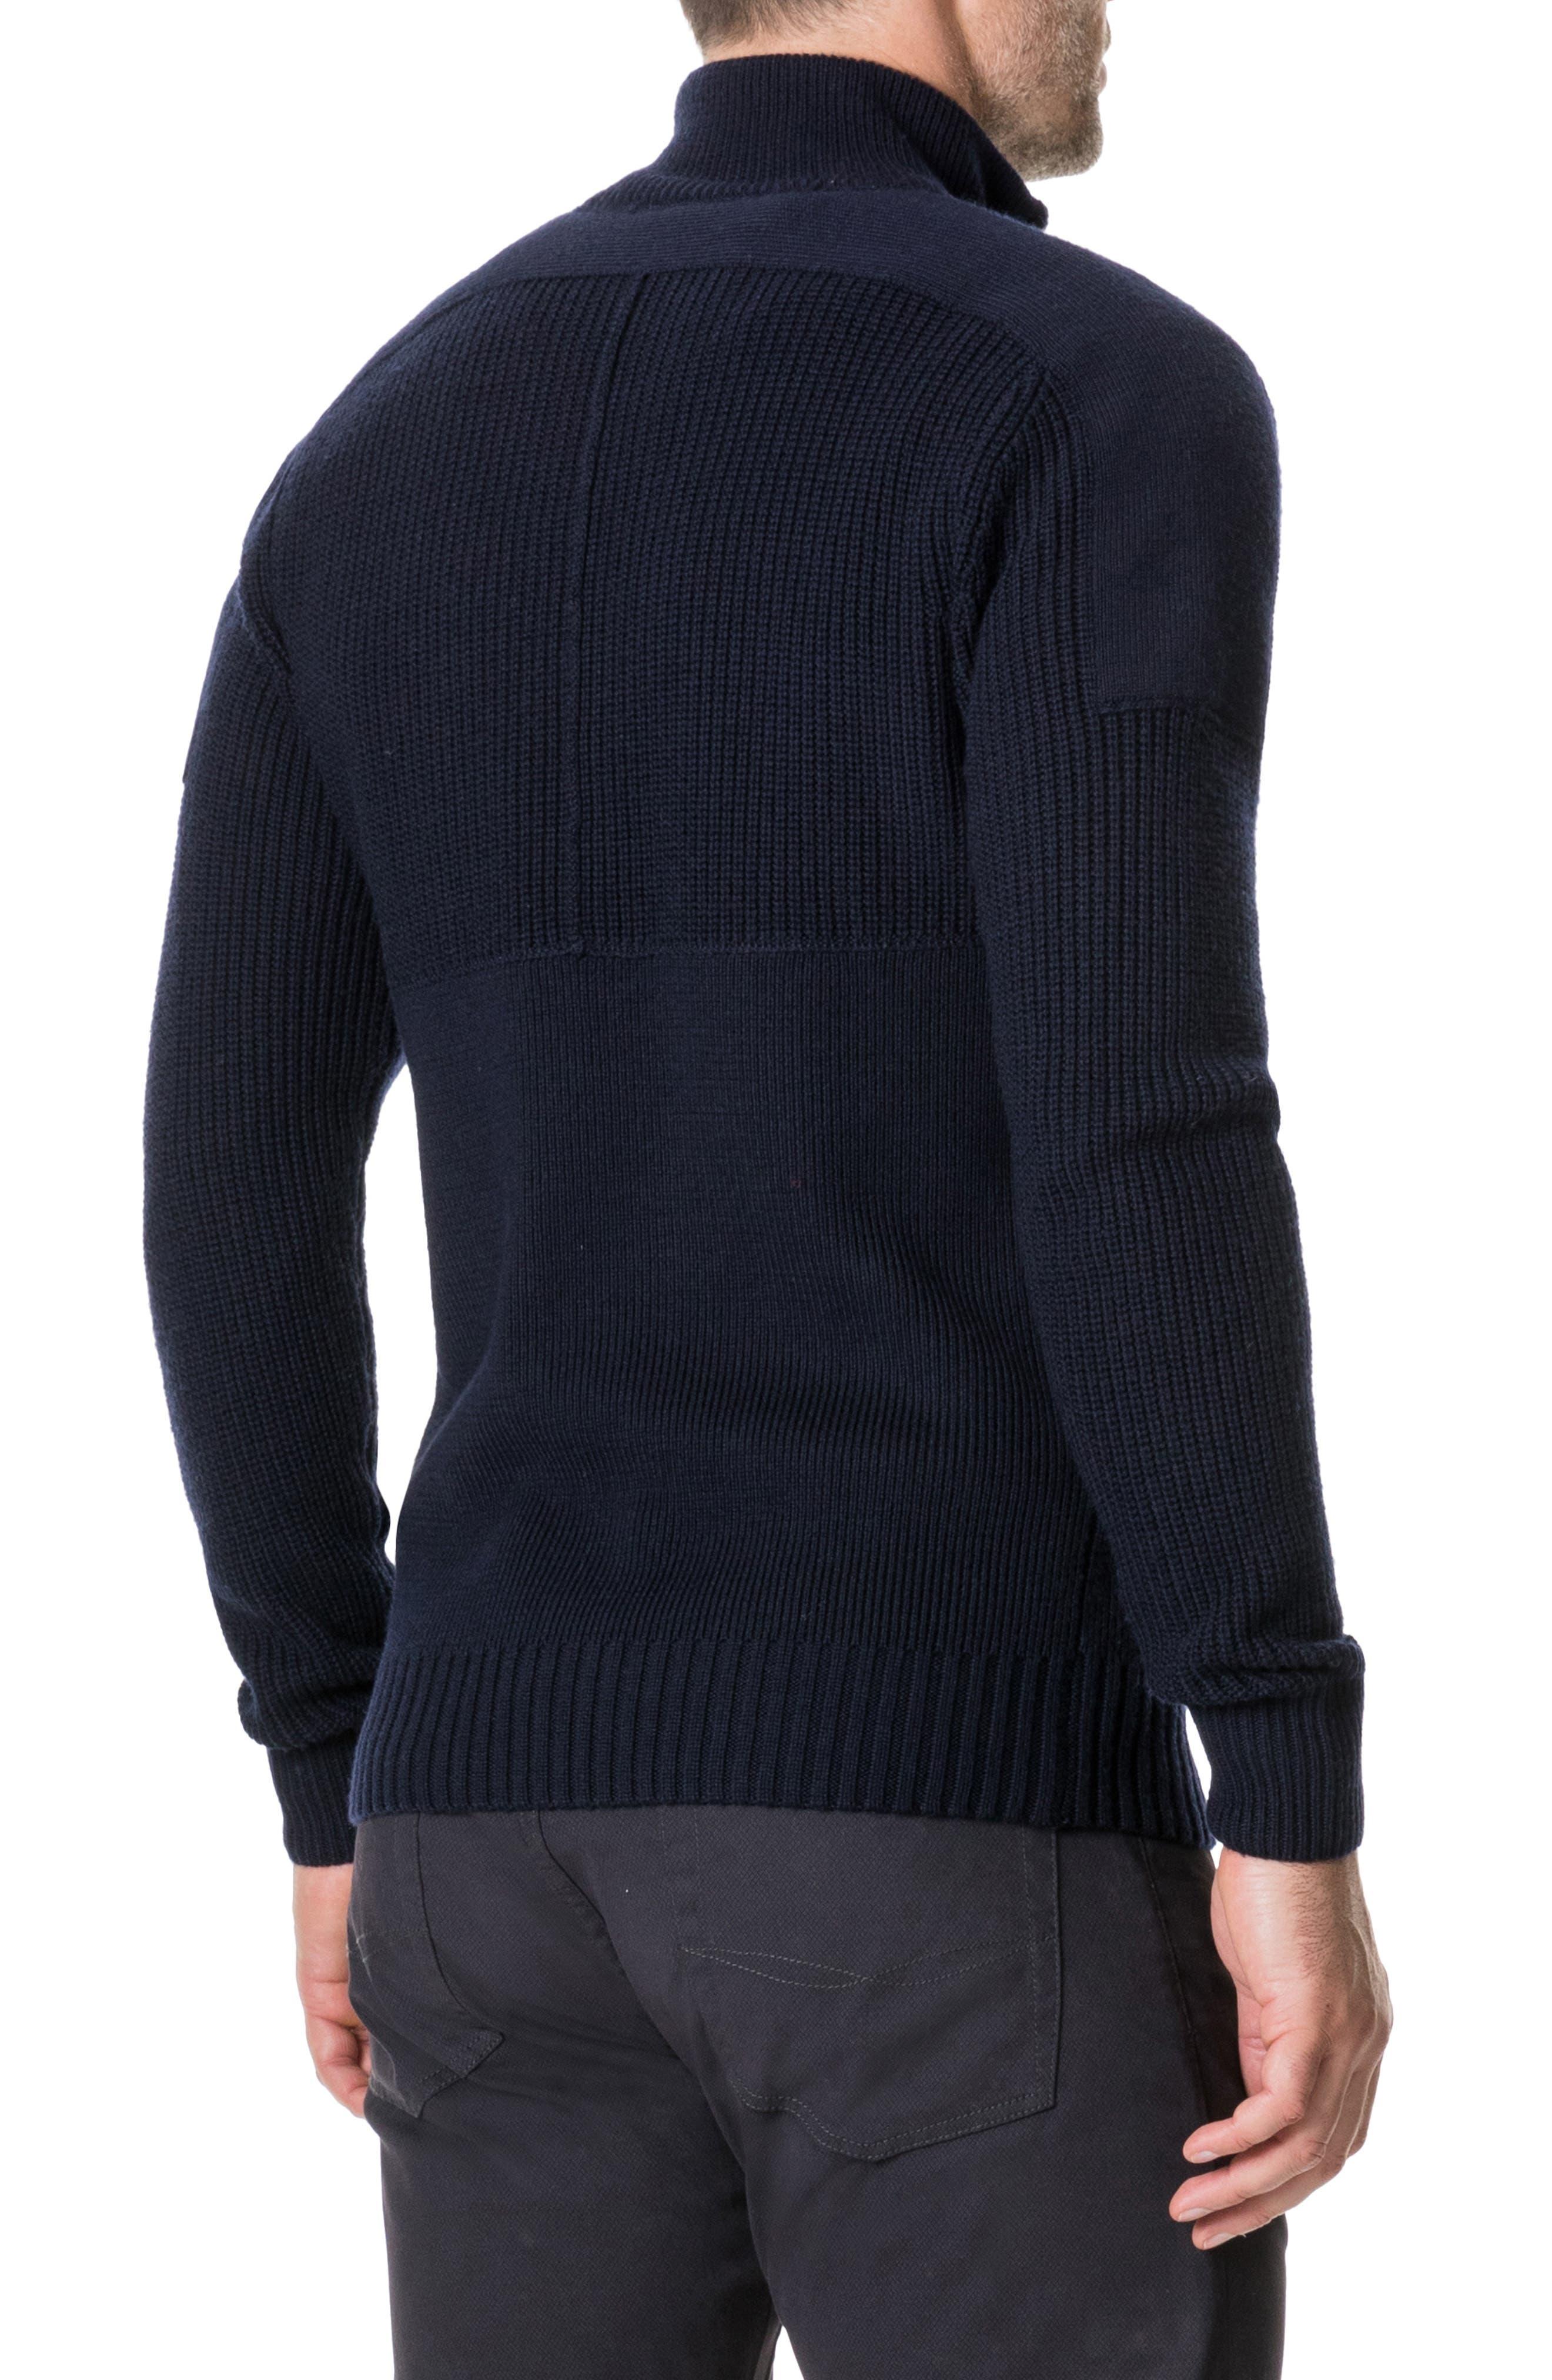 Kina Beach Merino Wool Zip Sweater,                             Alternate thumbnail 2, color,                             400